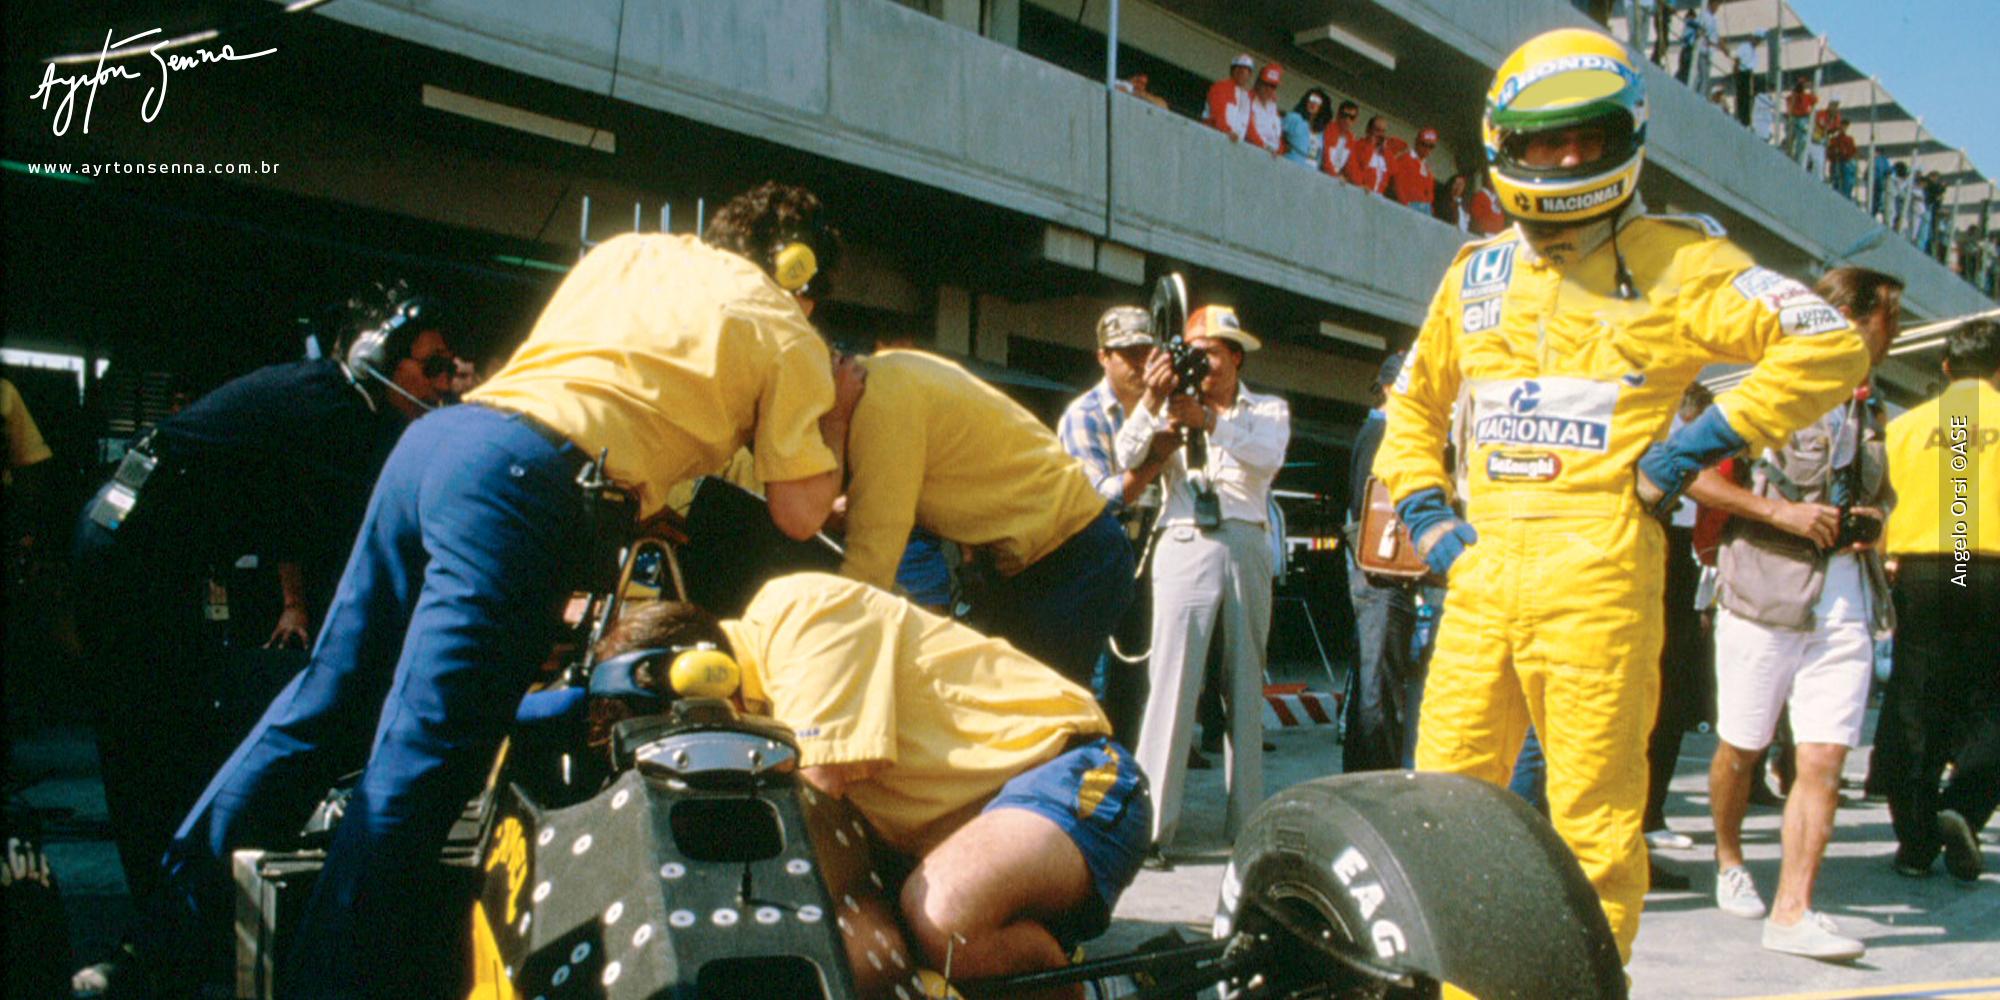 Thruxton Go Karting >> Mexican Grand Prix – 1987 - The history of Ayrton Senna